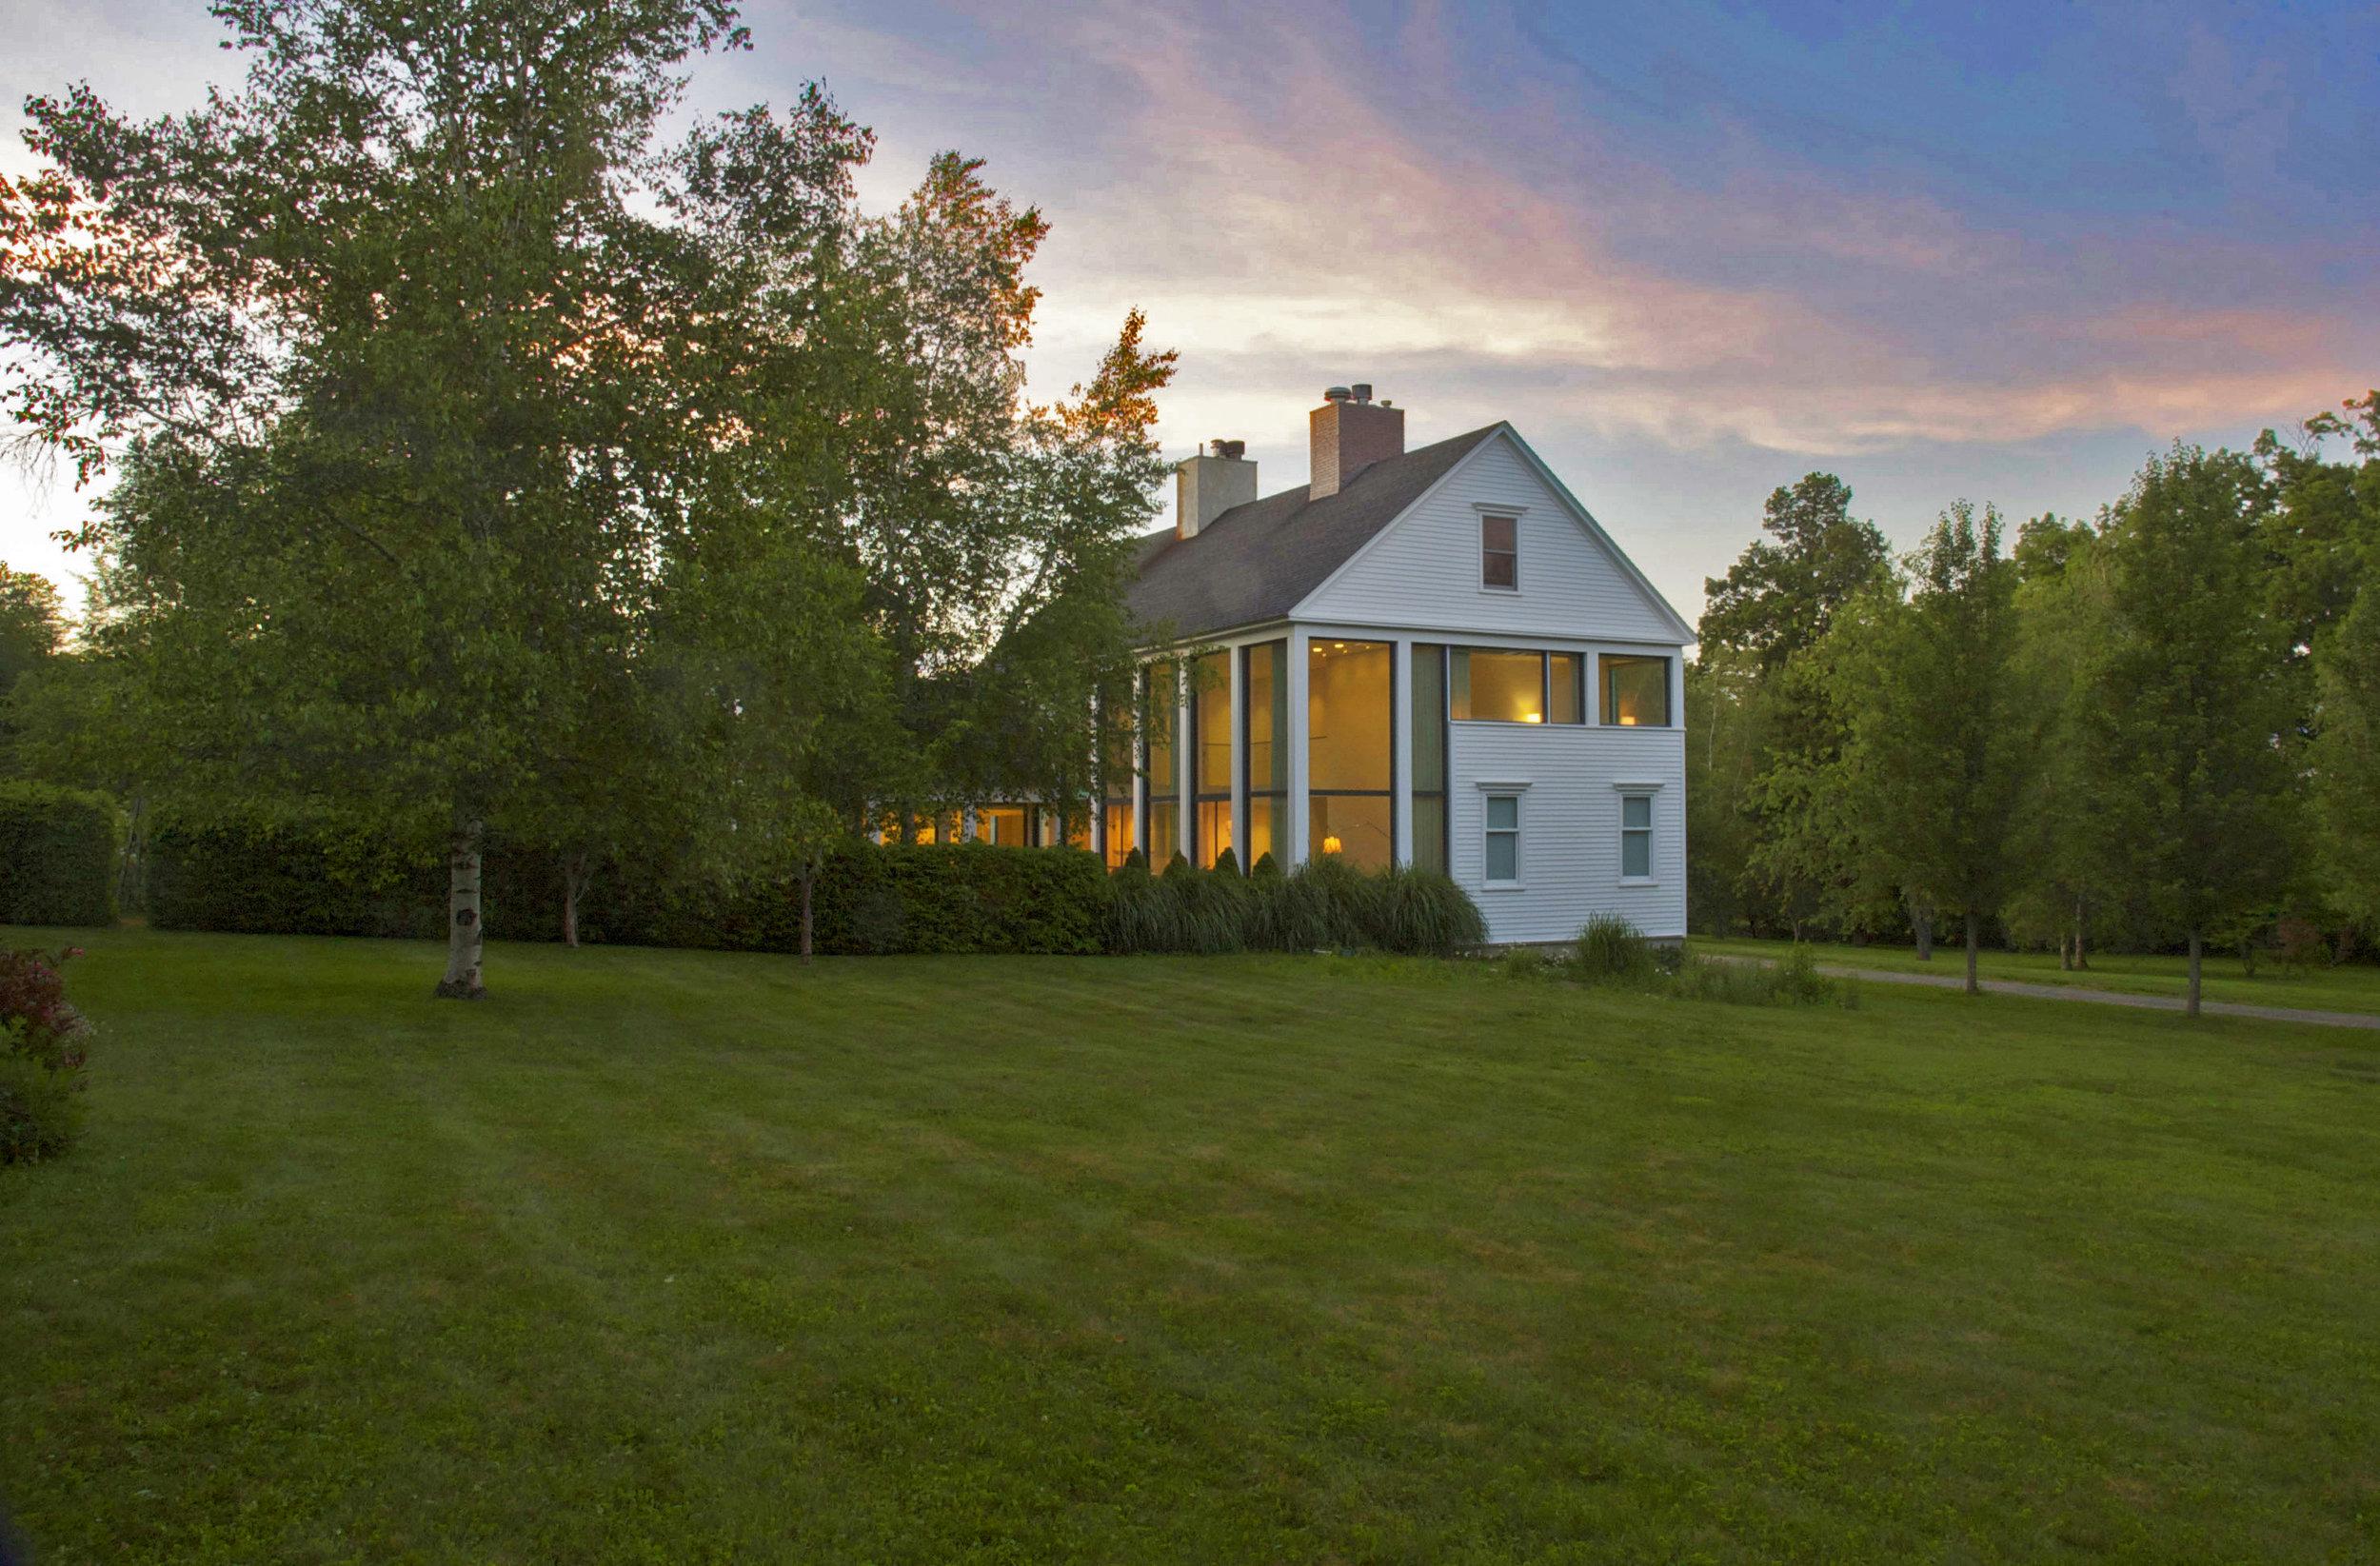 House on Chestnut Hill, Litchfield, CT